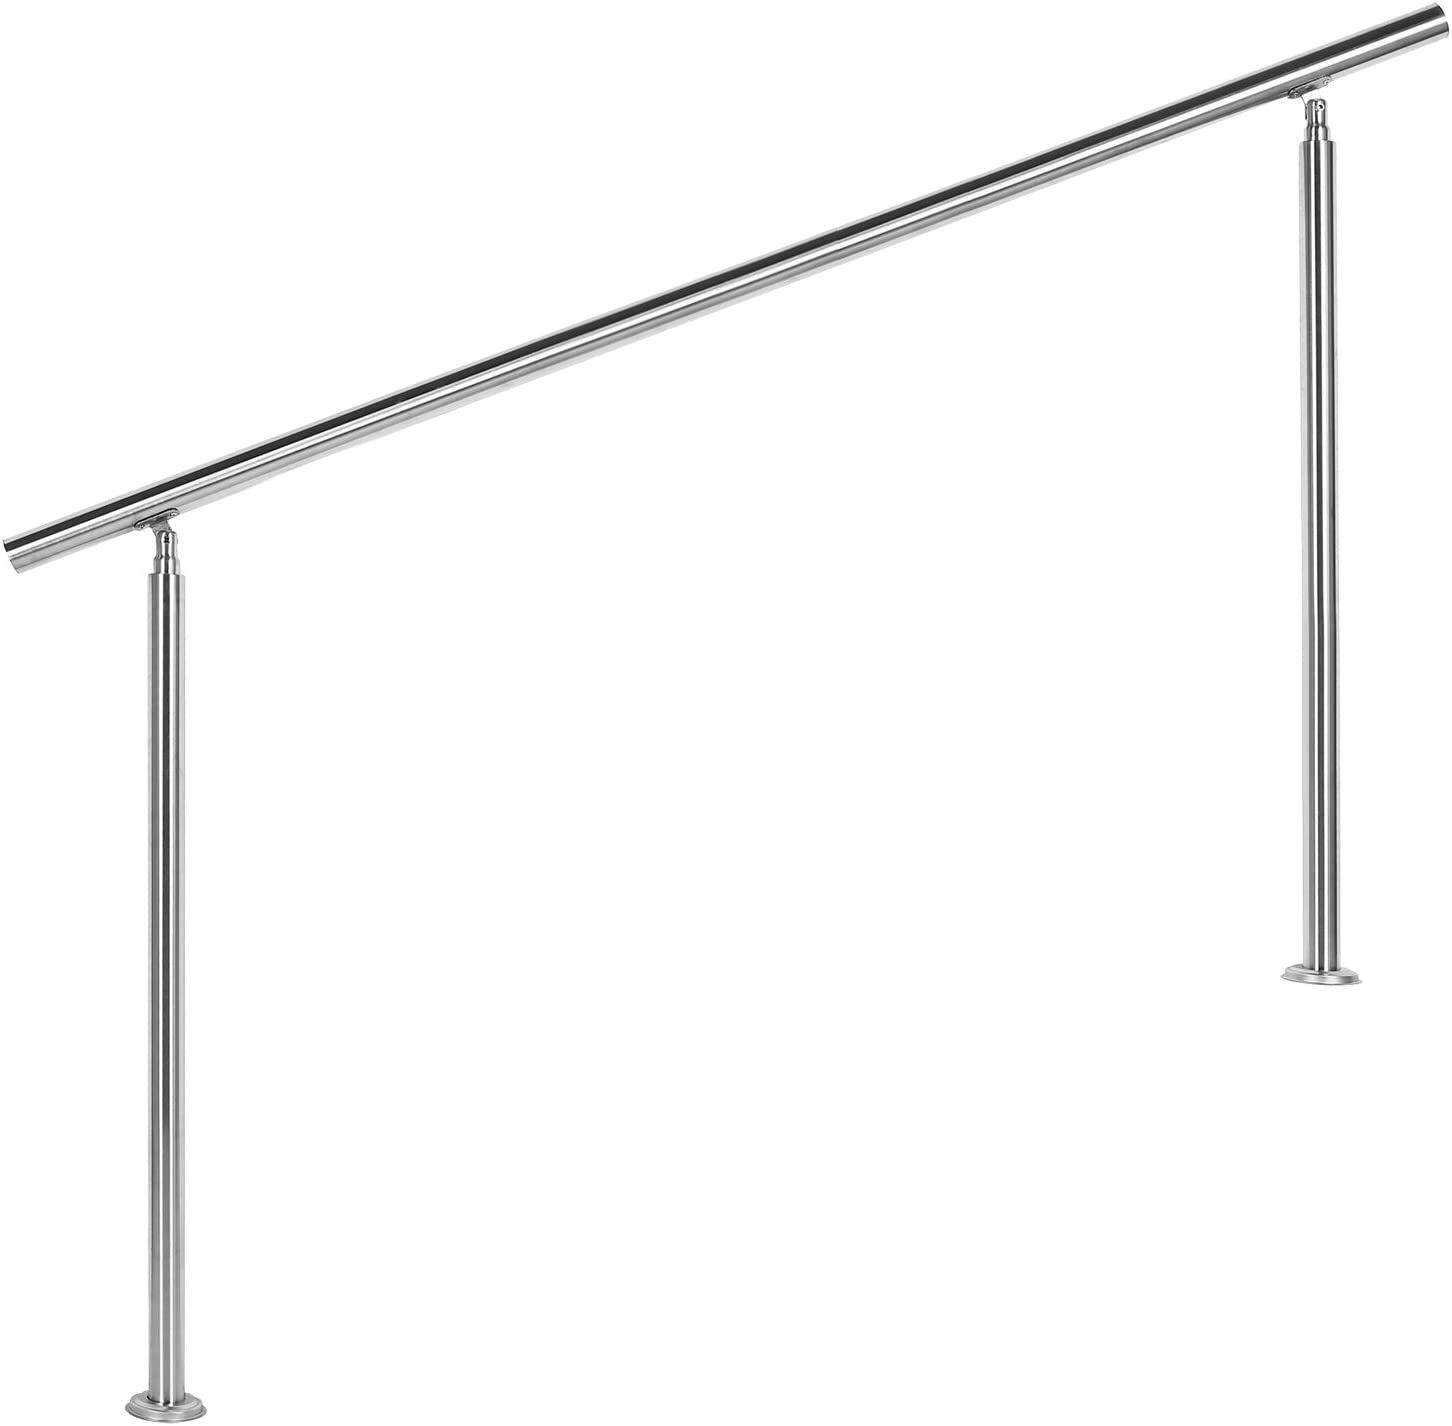 Barandilla acero inox 160cm Pasamanos escalera Parapeto